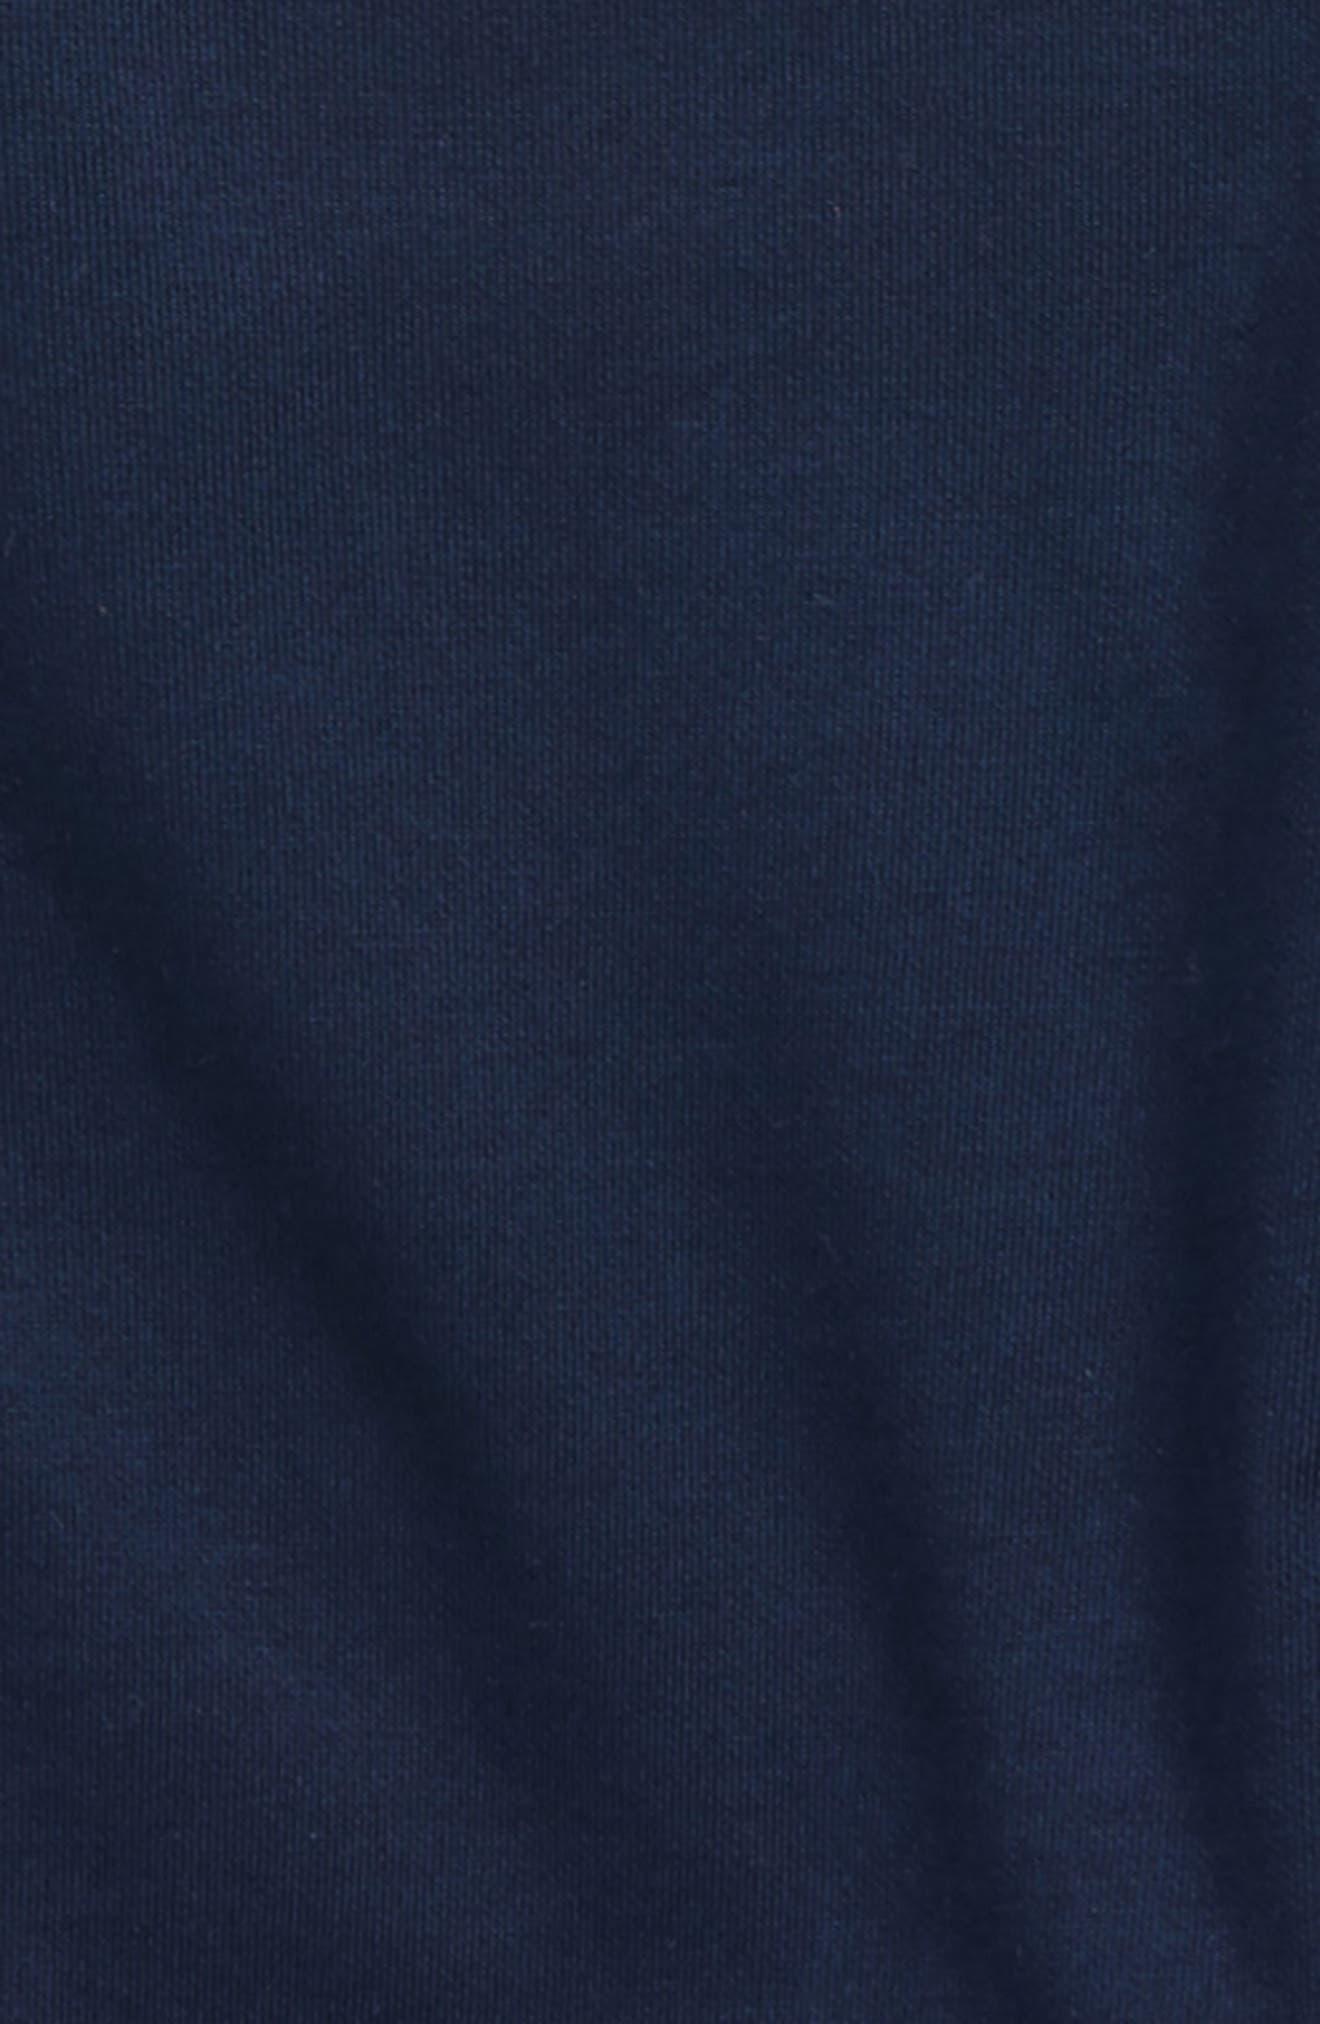 Raglan Sleeve Sweatshirt,                             Alternate thumbnail 6, color,